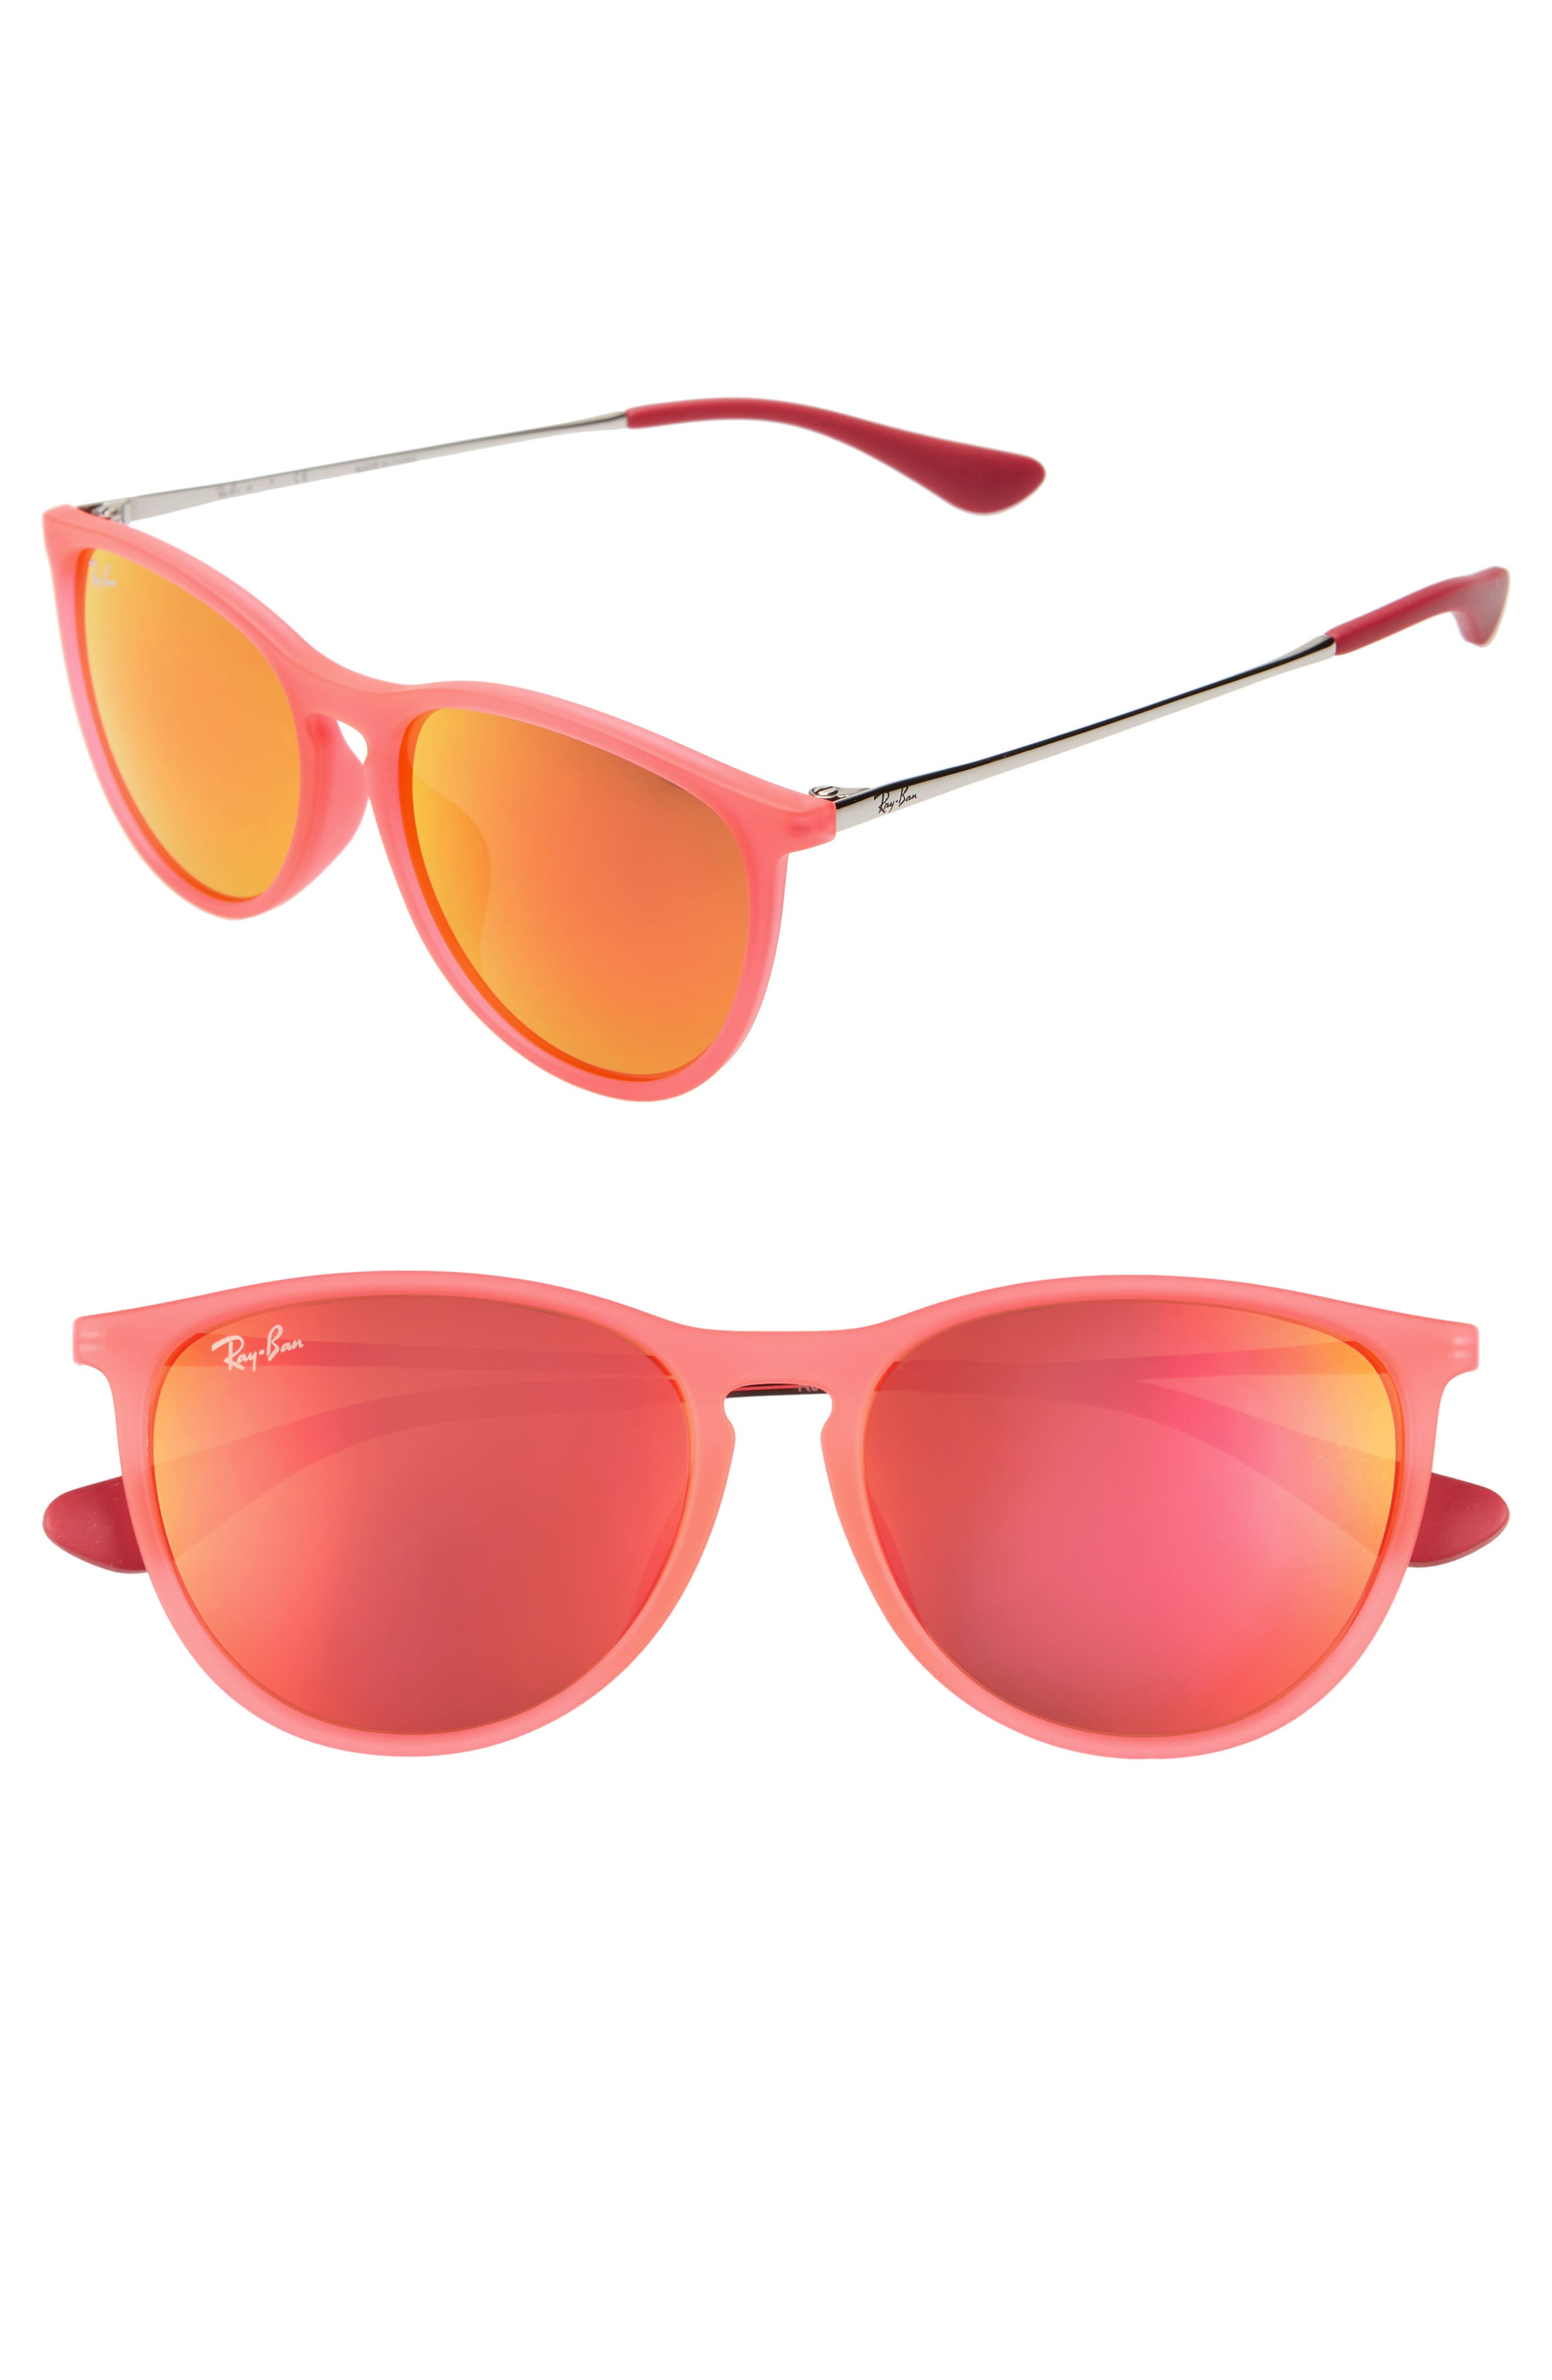 Ray-Ban Erika Junior 52Mm Mirrored Sunglasses - Pink/ Orange Brown Mirror